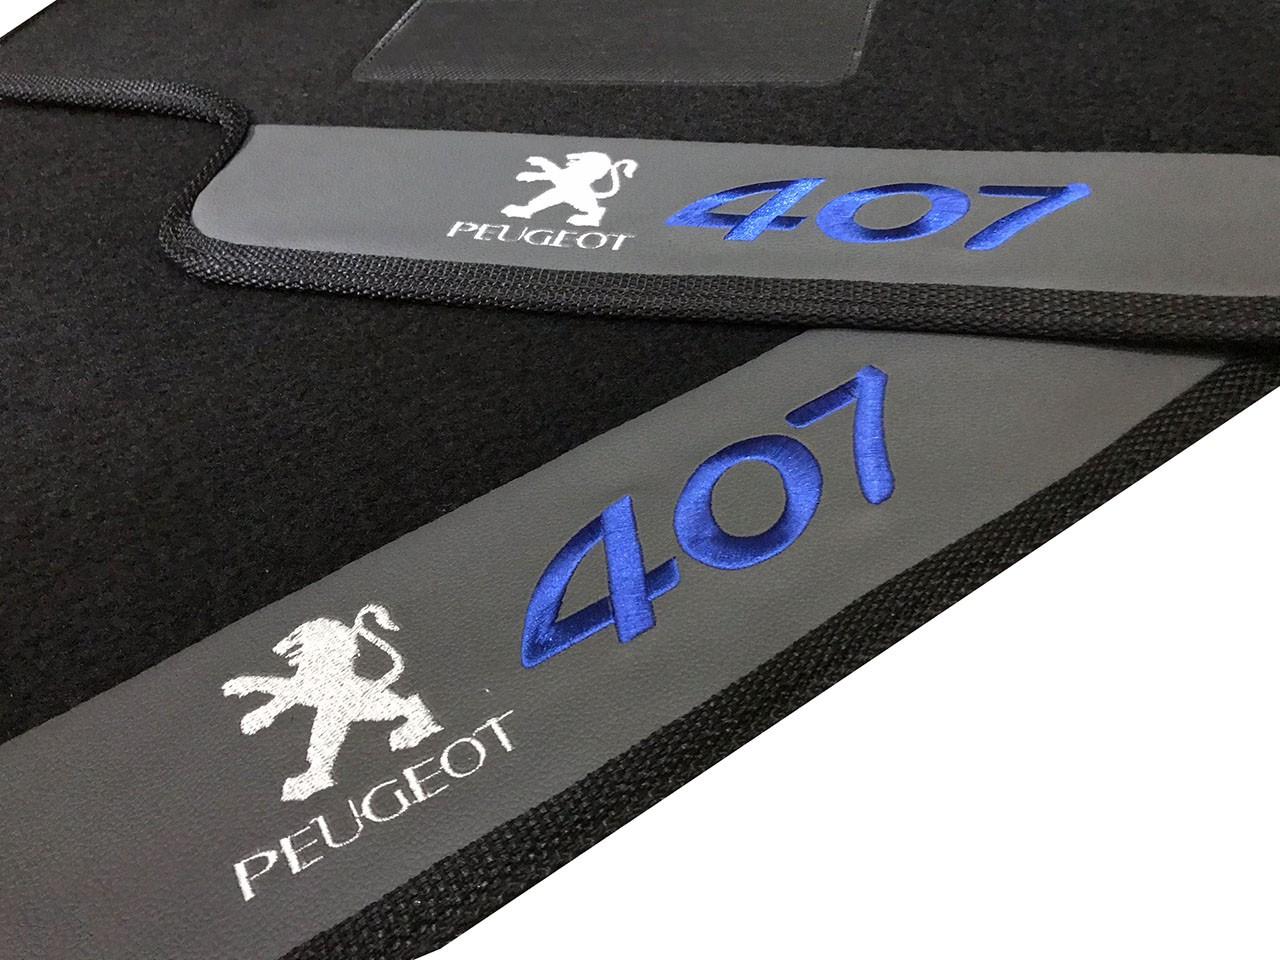 Tapete Peugeot 407 Carpete Premium Base Pinada